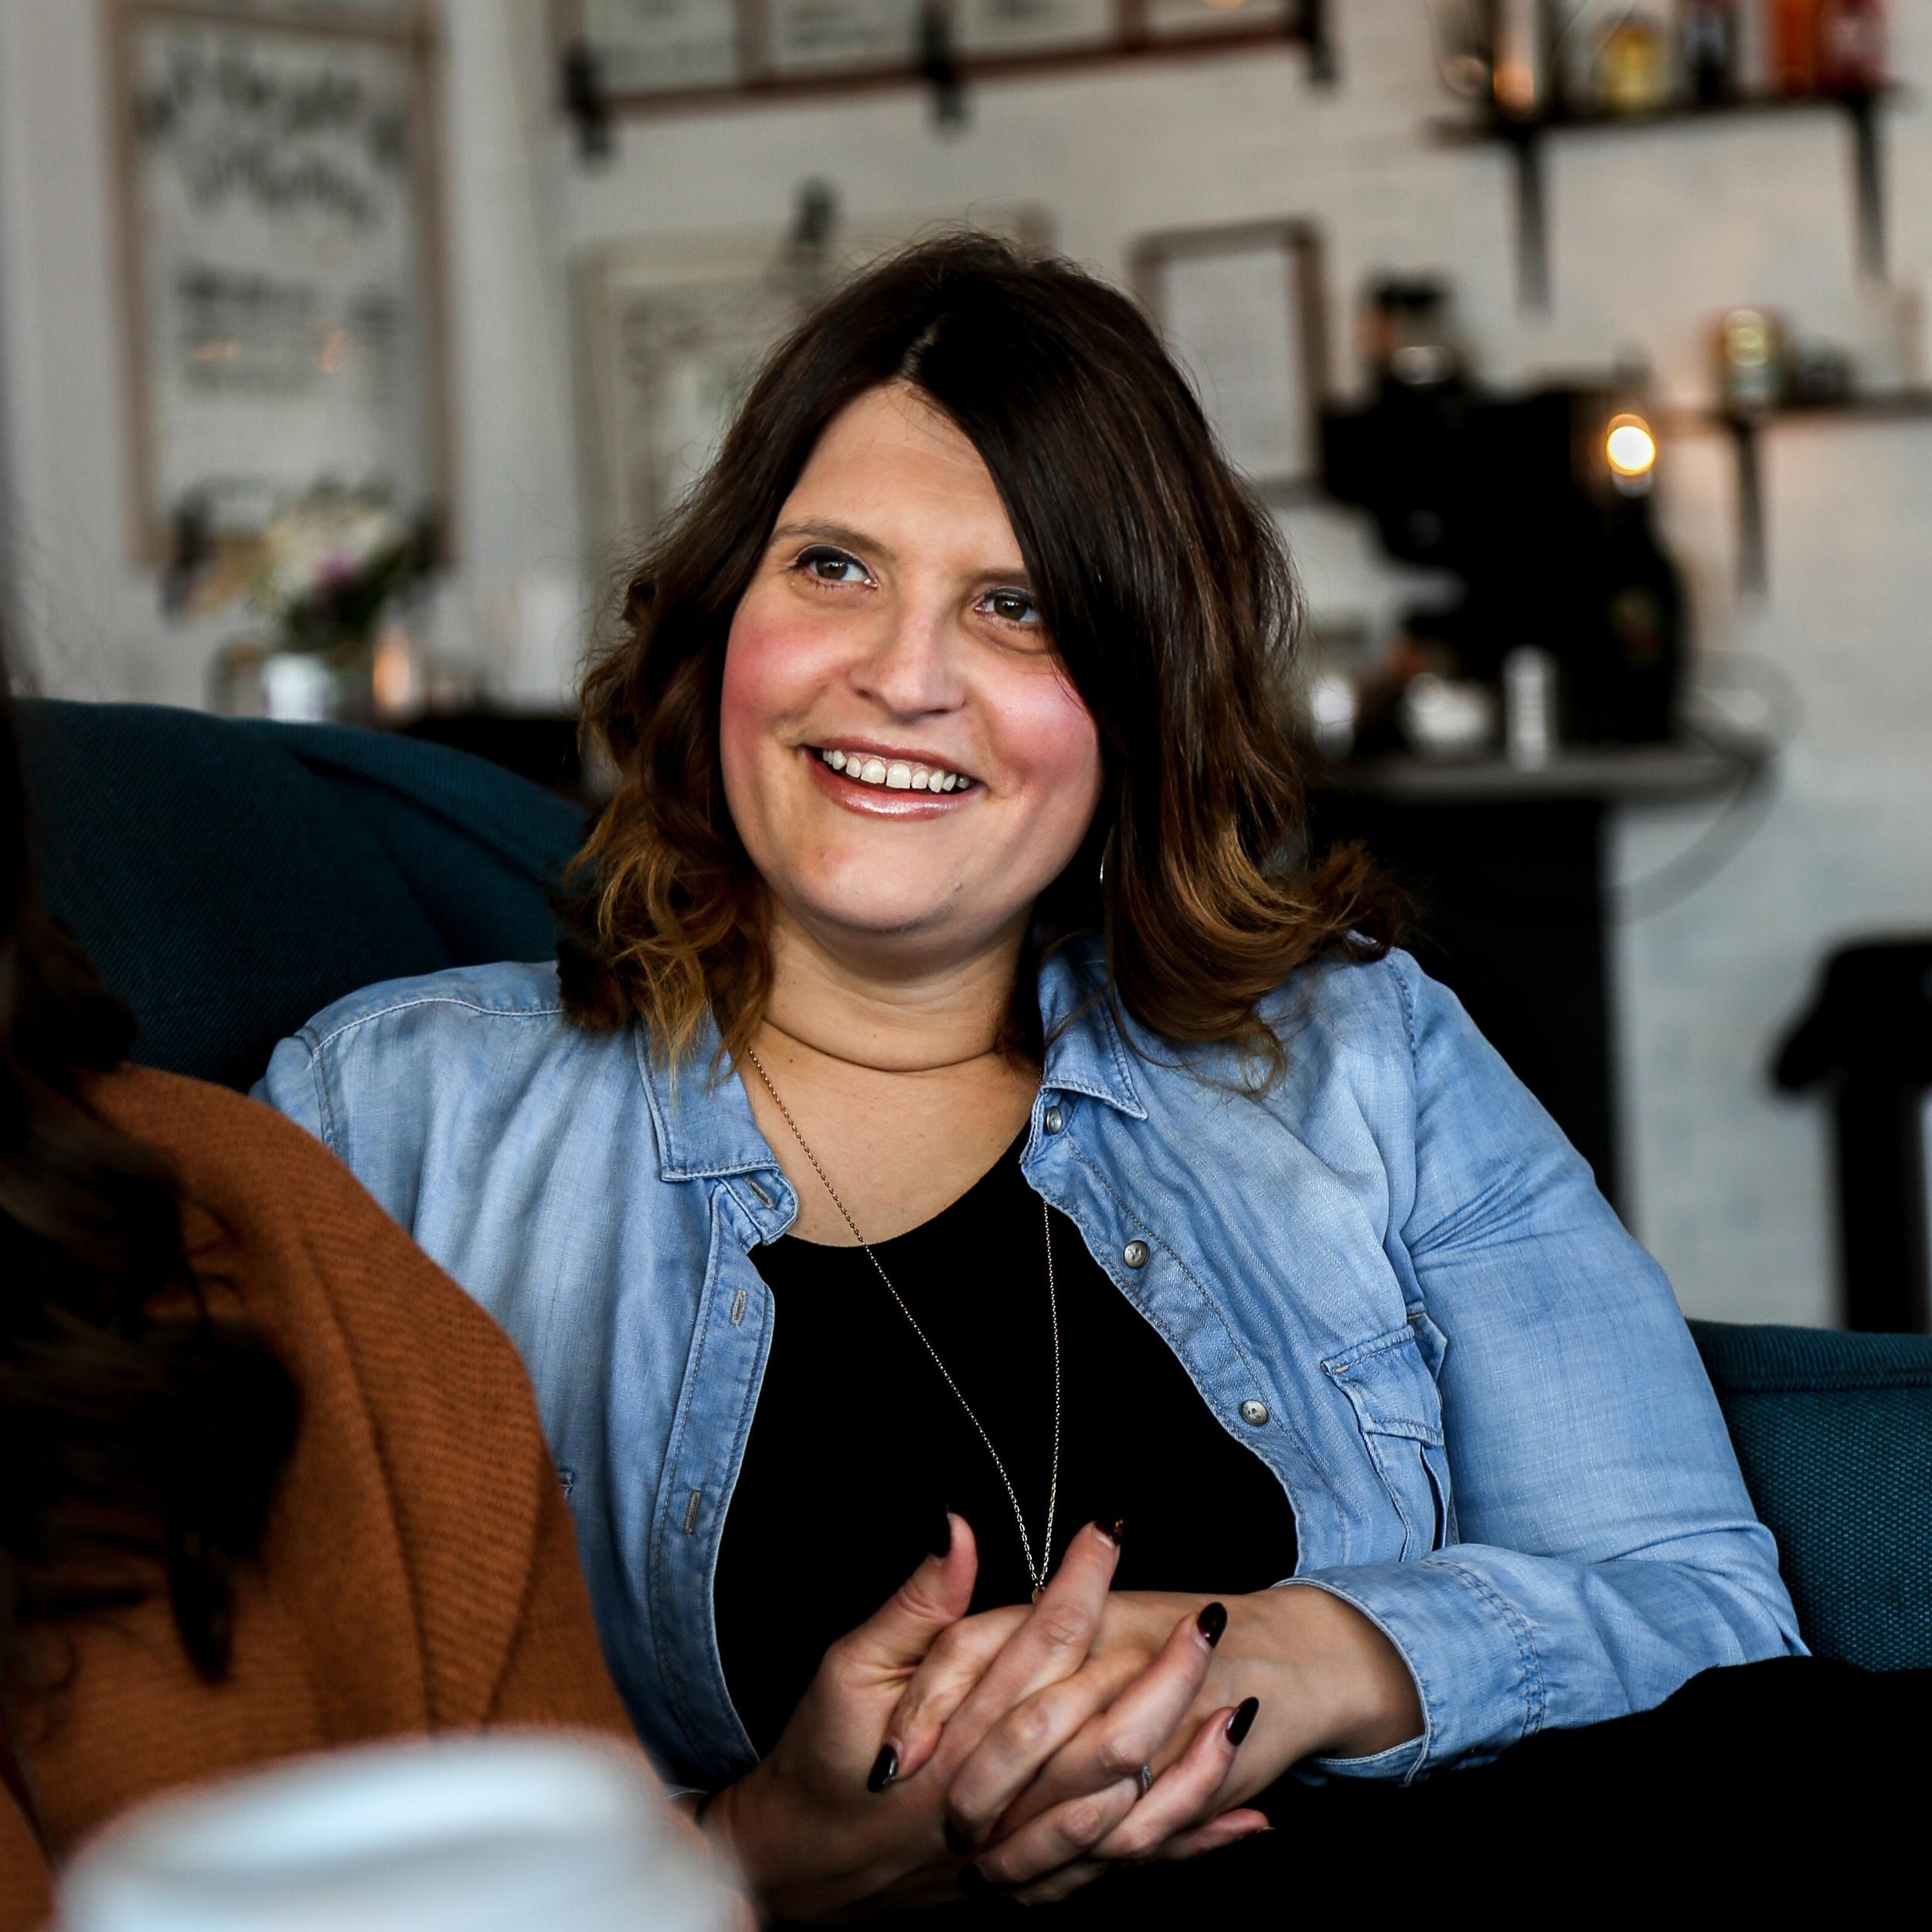 Kristen Goldsby - Community Pastor